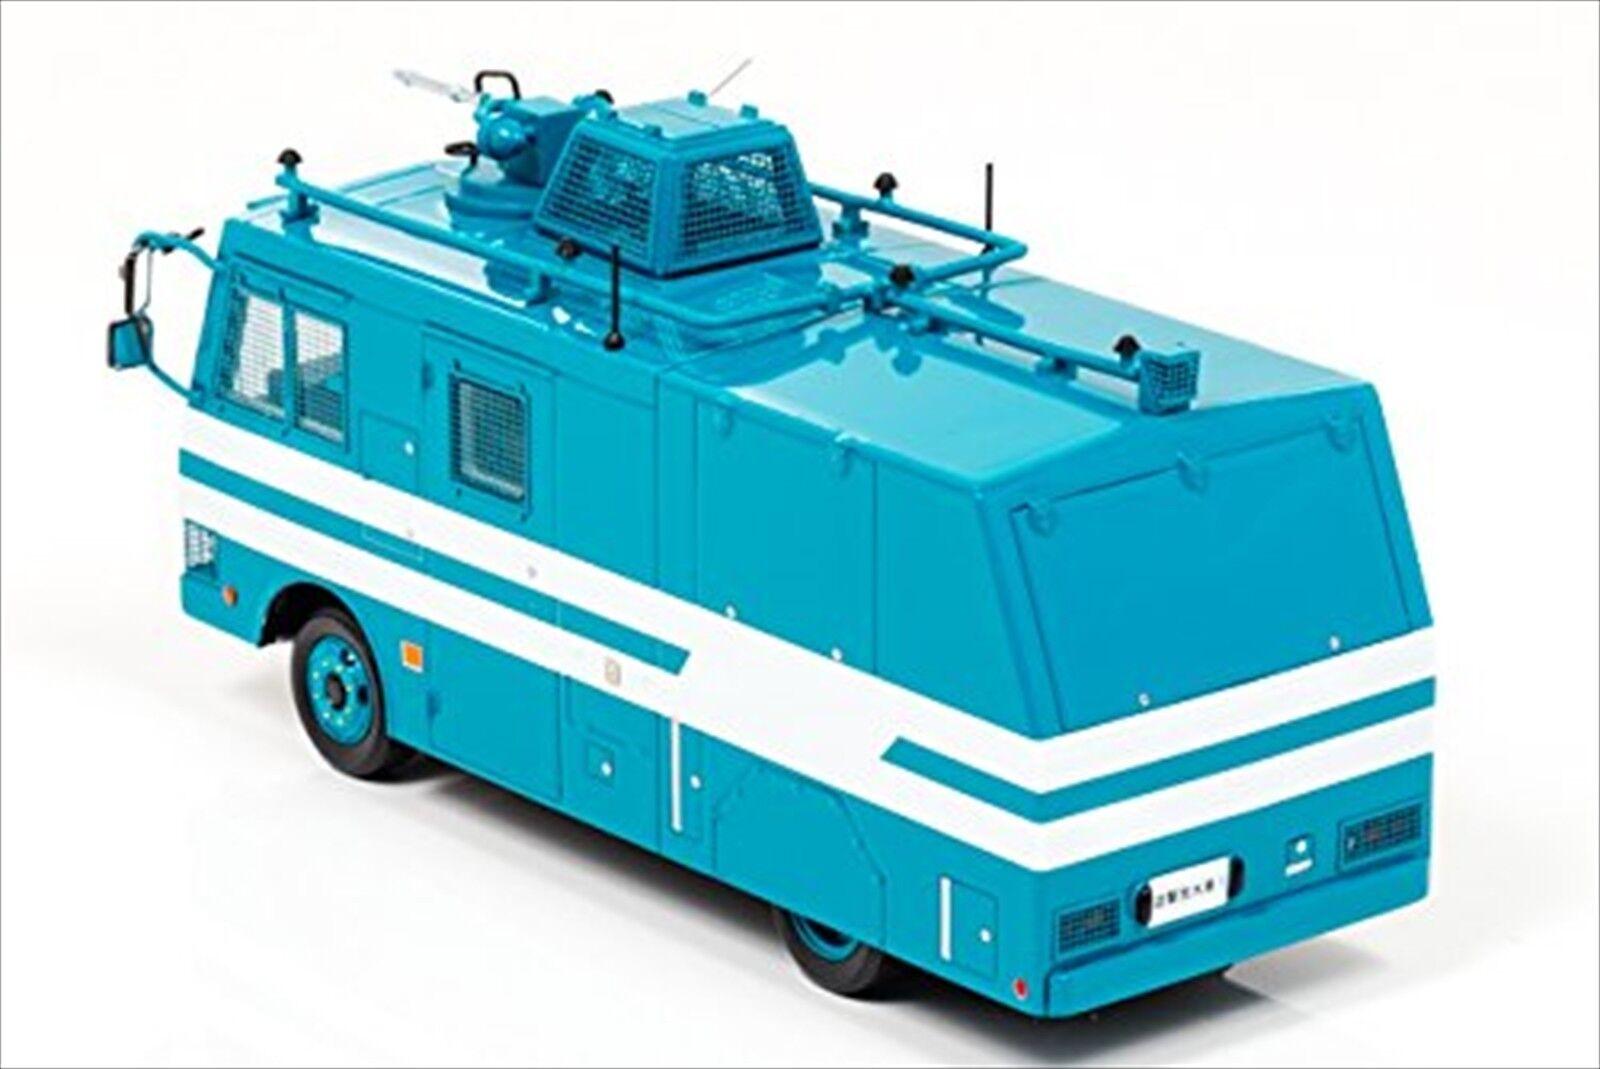 RAI/'S 1//43 2007 Japan Police Guard Guerrilla Water Cannon Vehicle H7430716